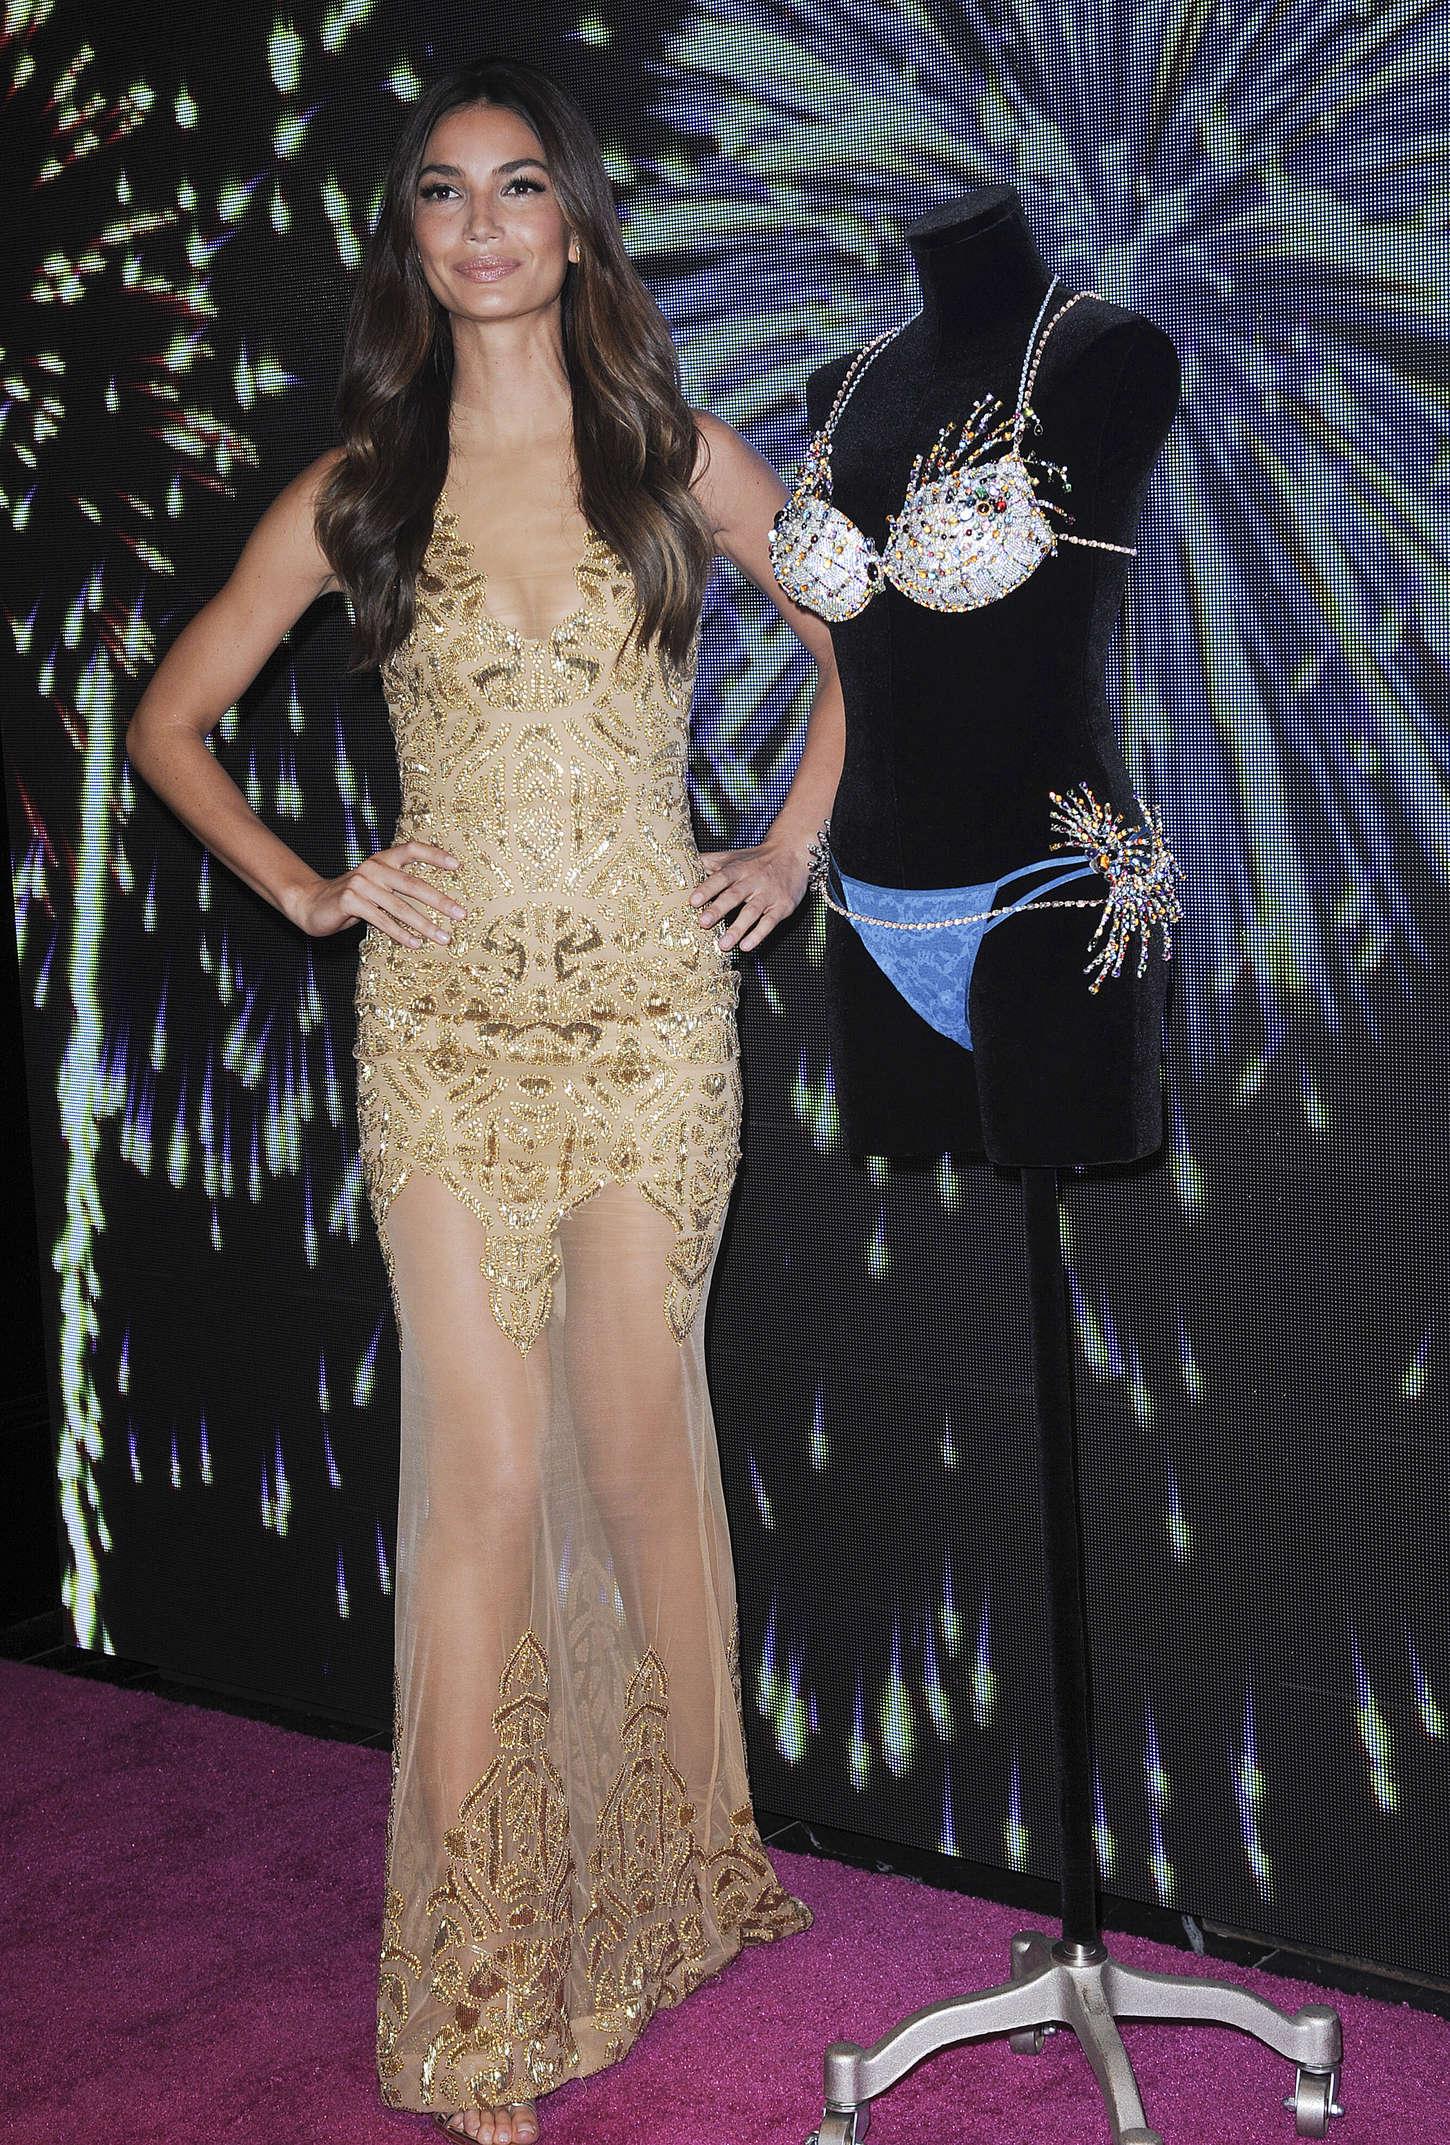 Lily Aldridge from Celebs Support Caitlyn Jenner   E! News